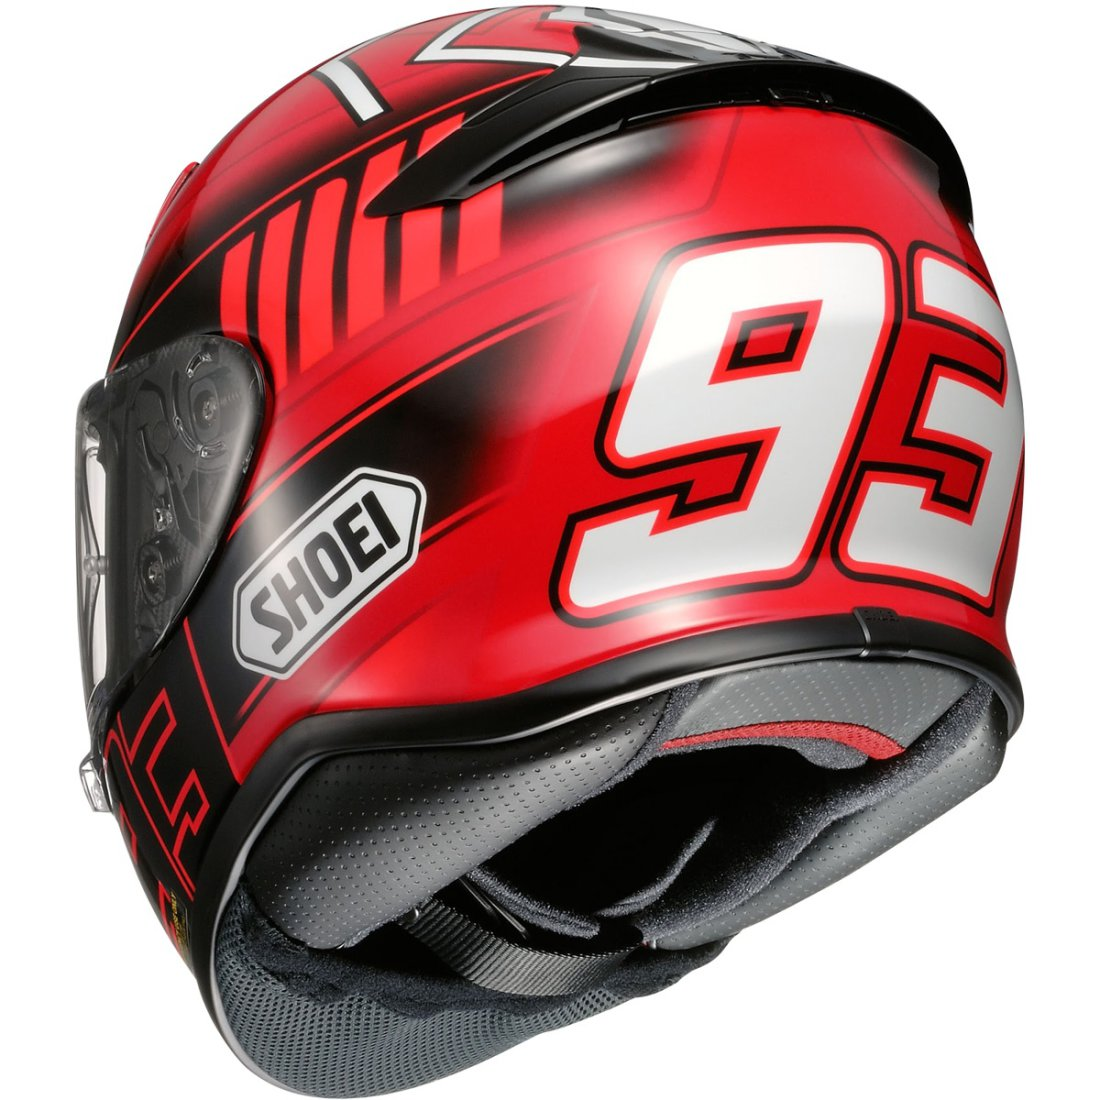 shoei nxr marquez 3 tc 1 helmet motocard. Black Bedroom Furniture Sets. Home Design Ideas